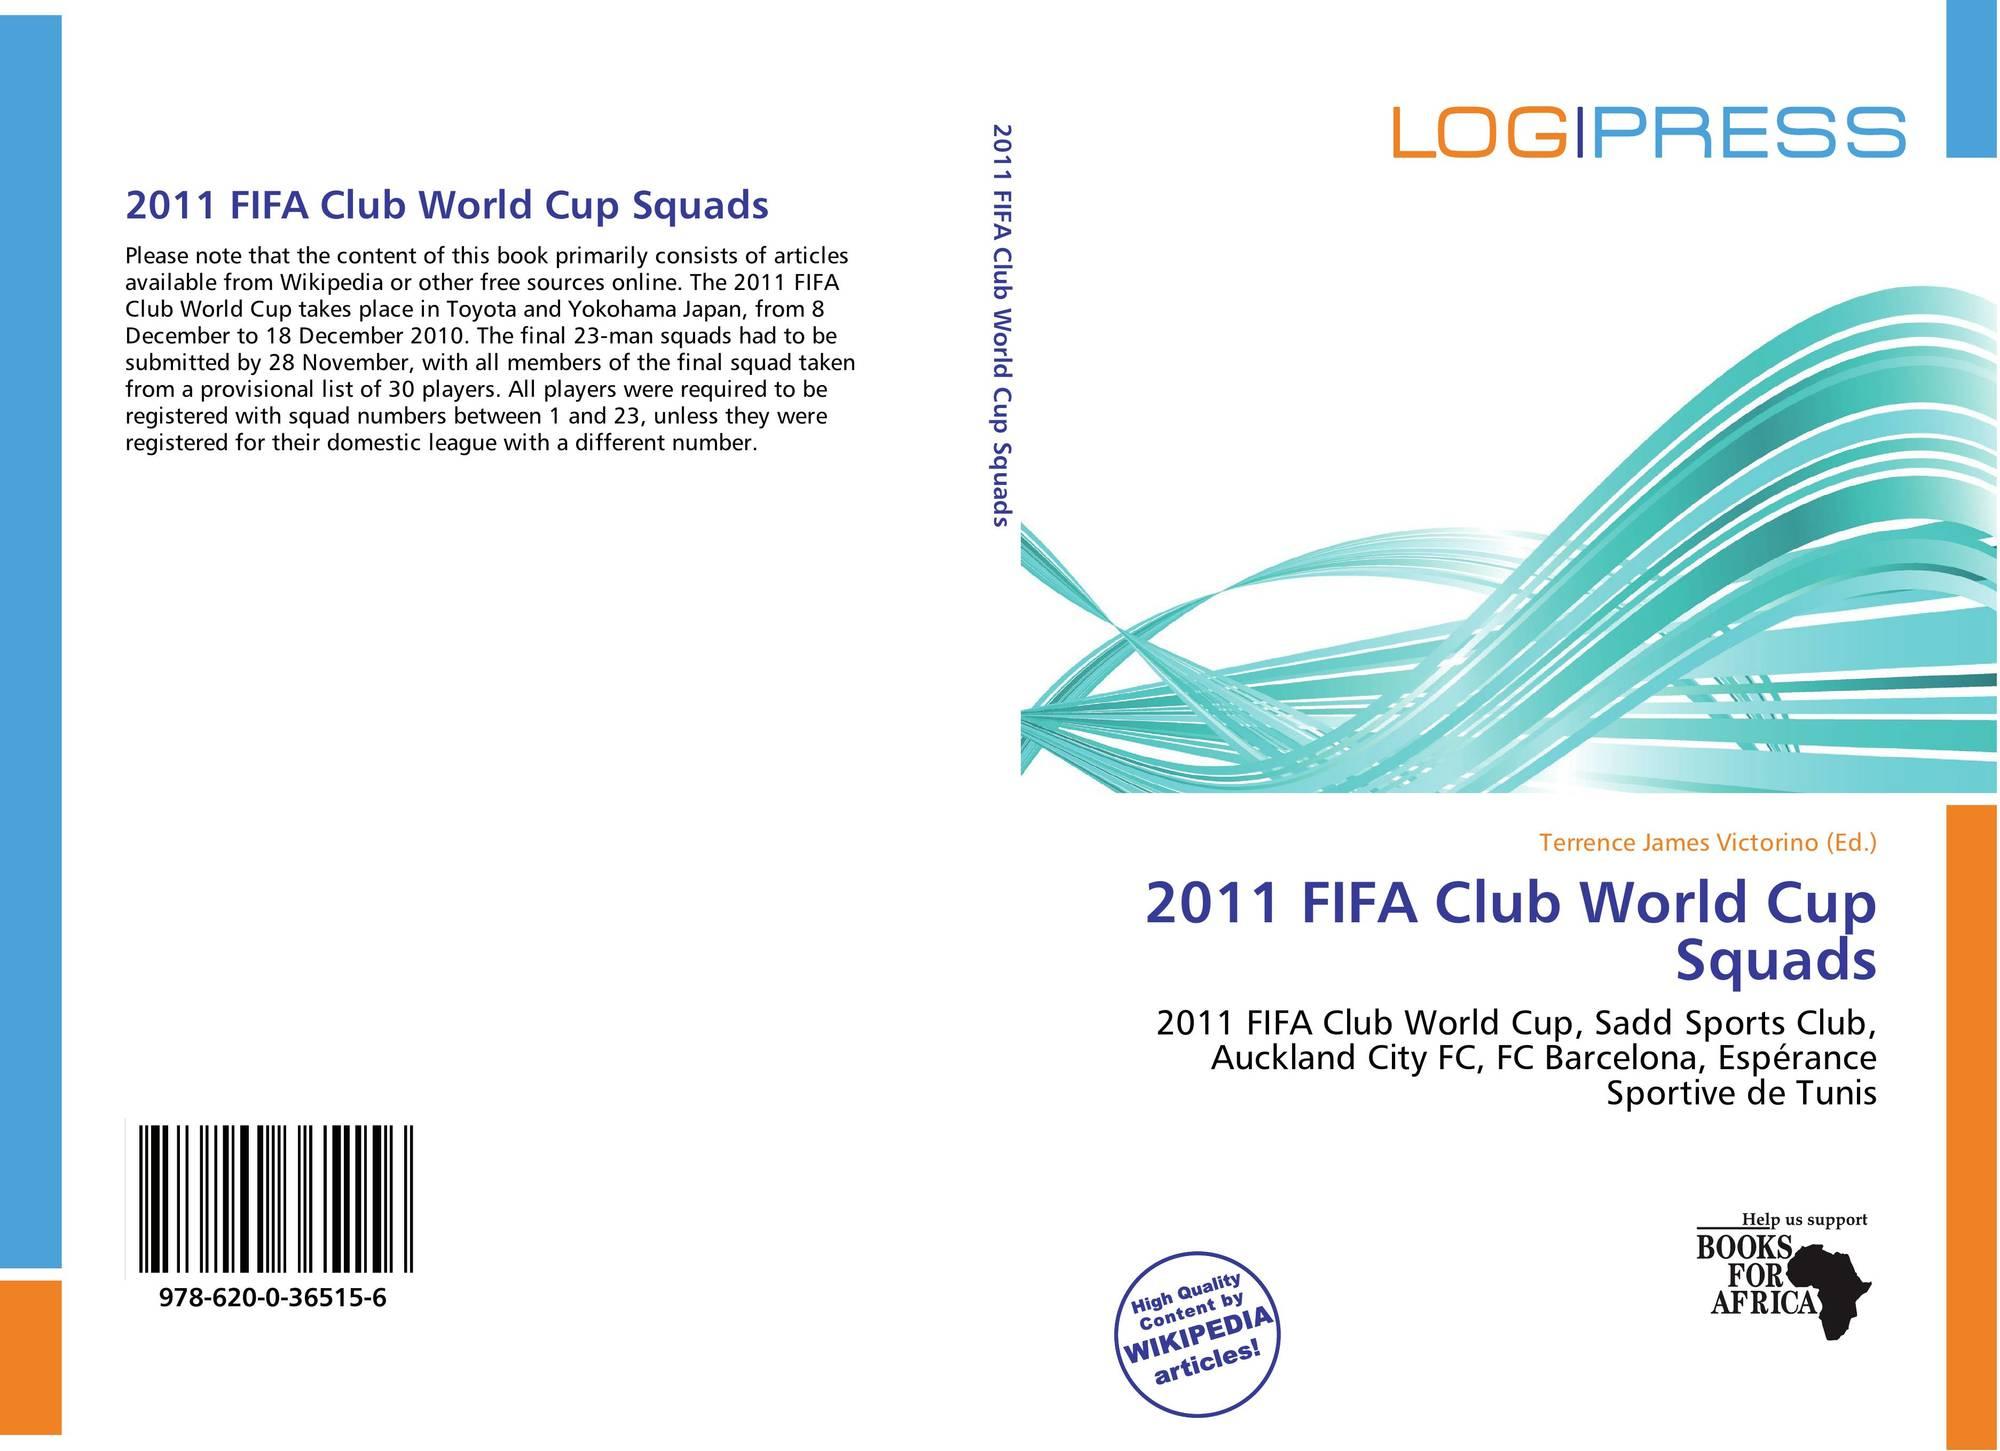 2011 FIFA Club World Cup Squads, 978-620-0-36515-6